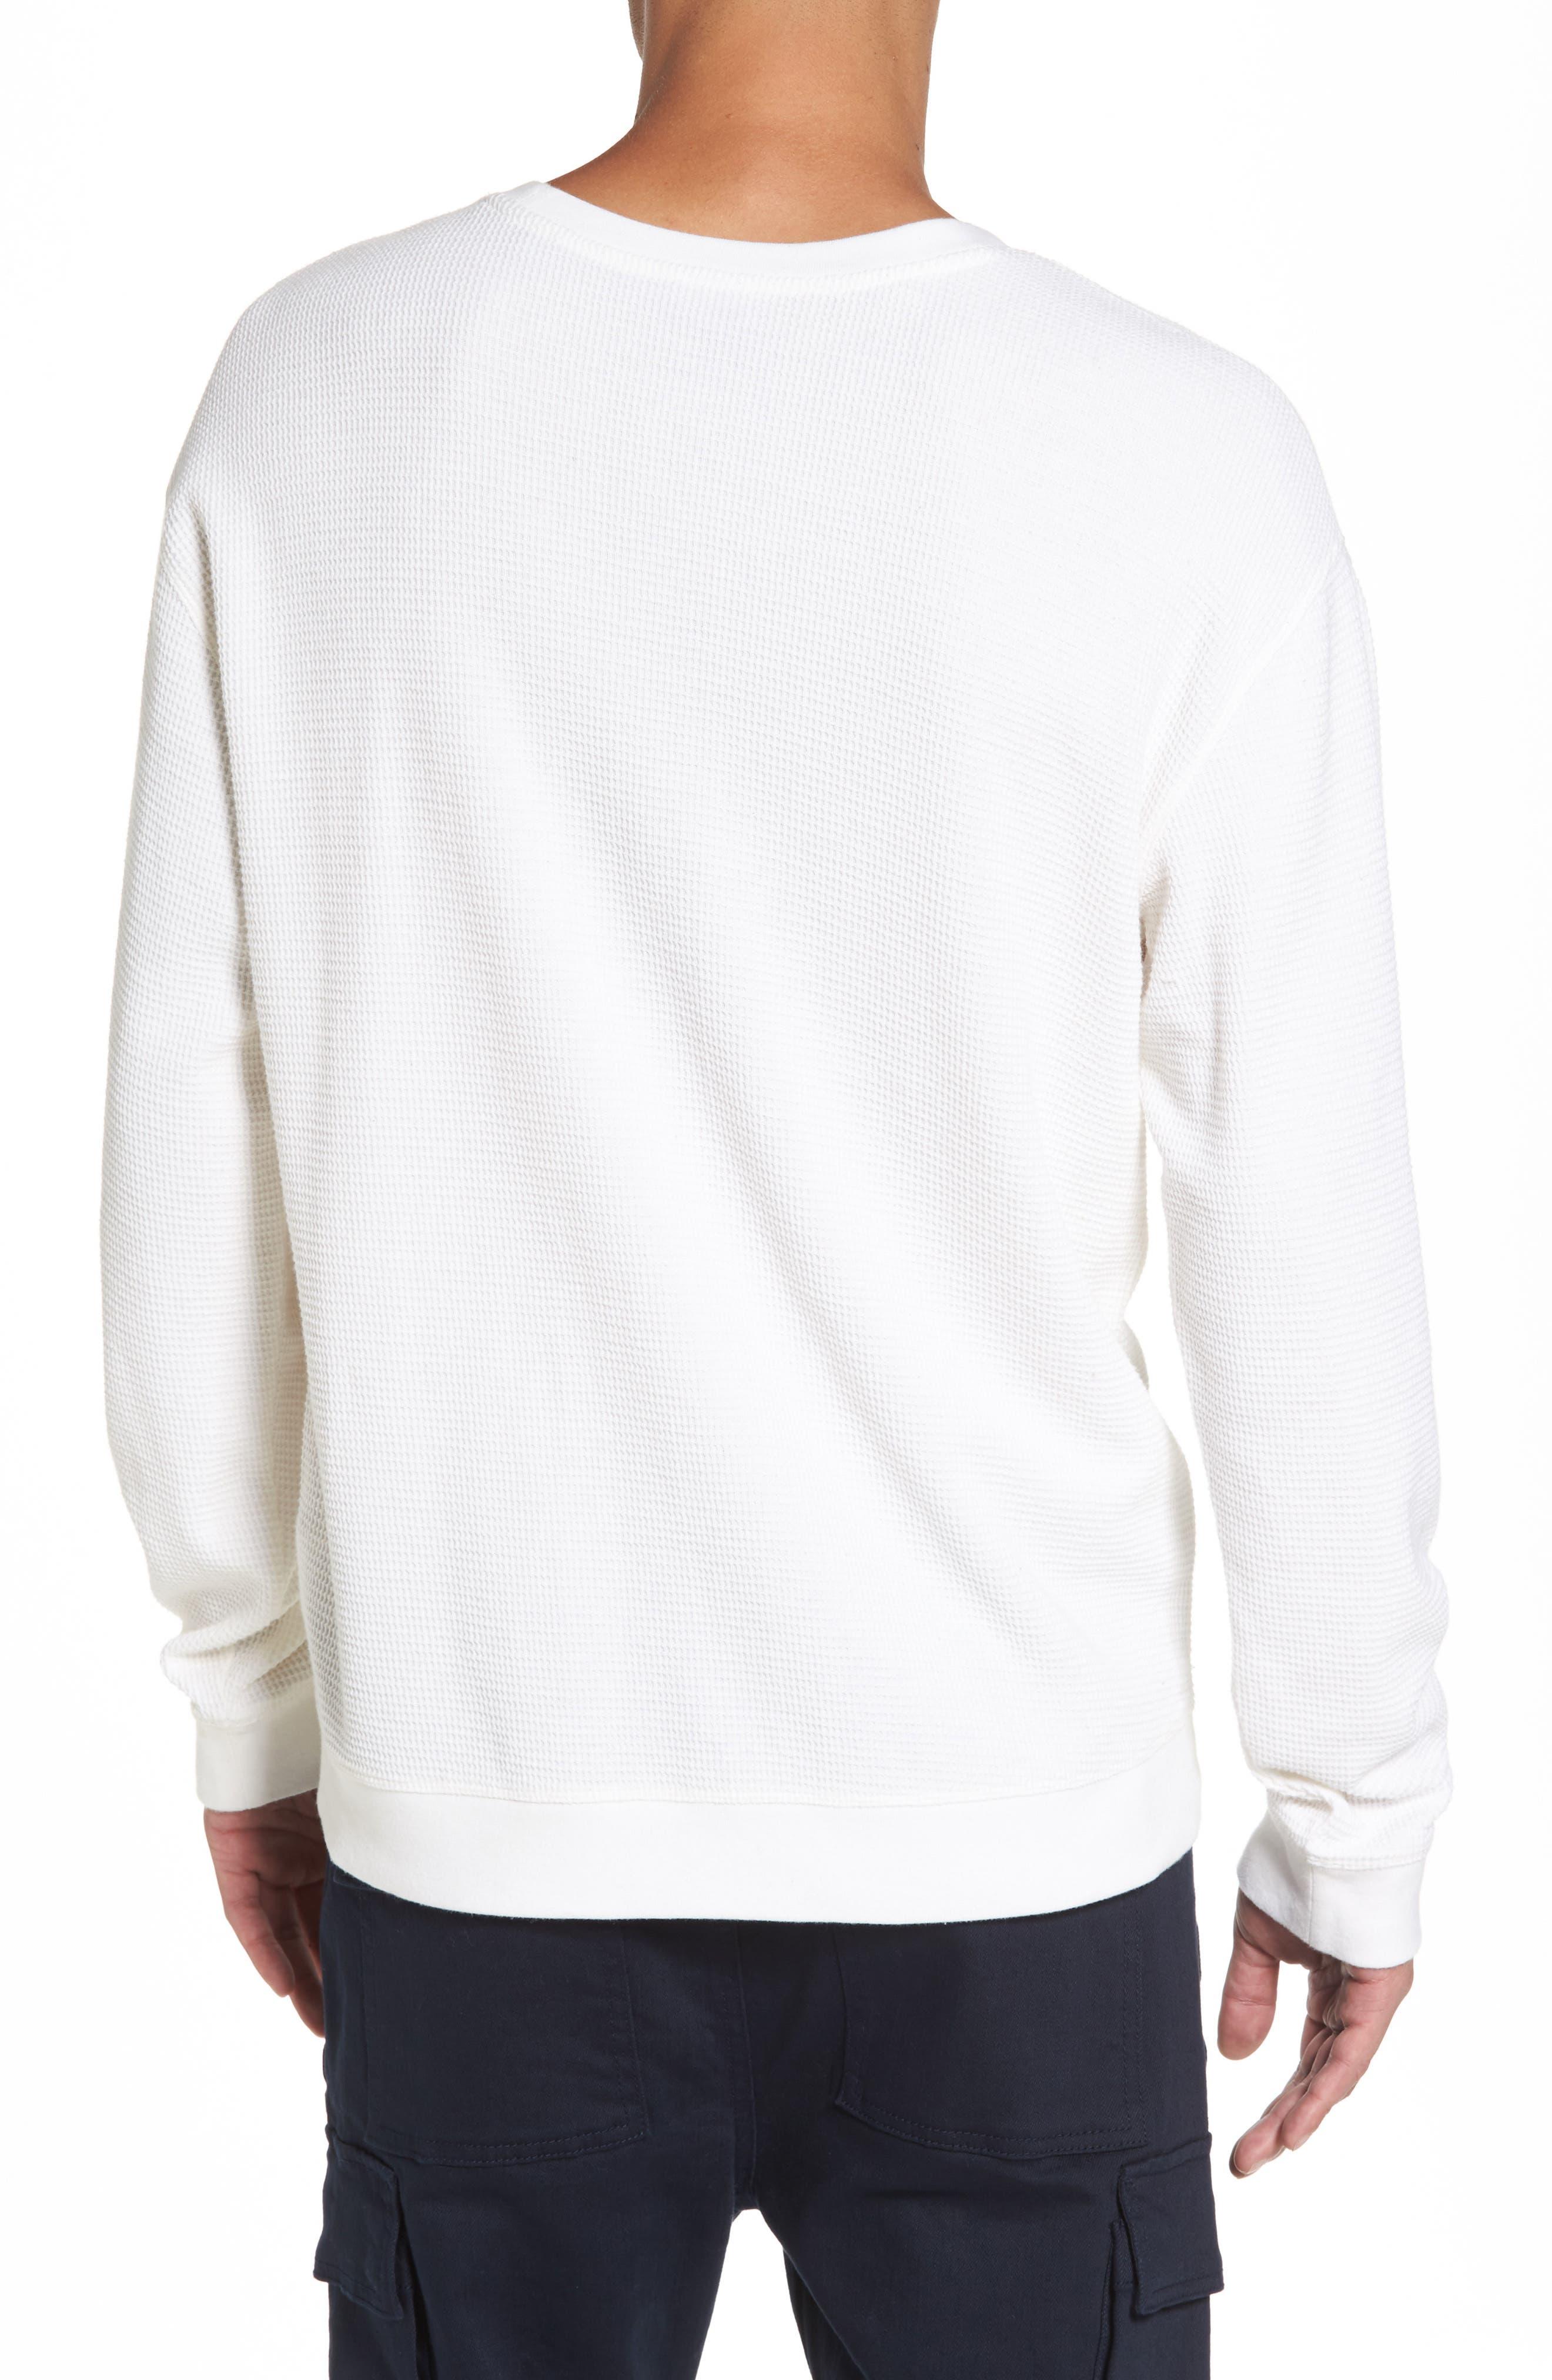 Waffle Knit Sweatshirt,                             Alternate thumbnail 2, color,                             White